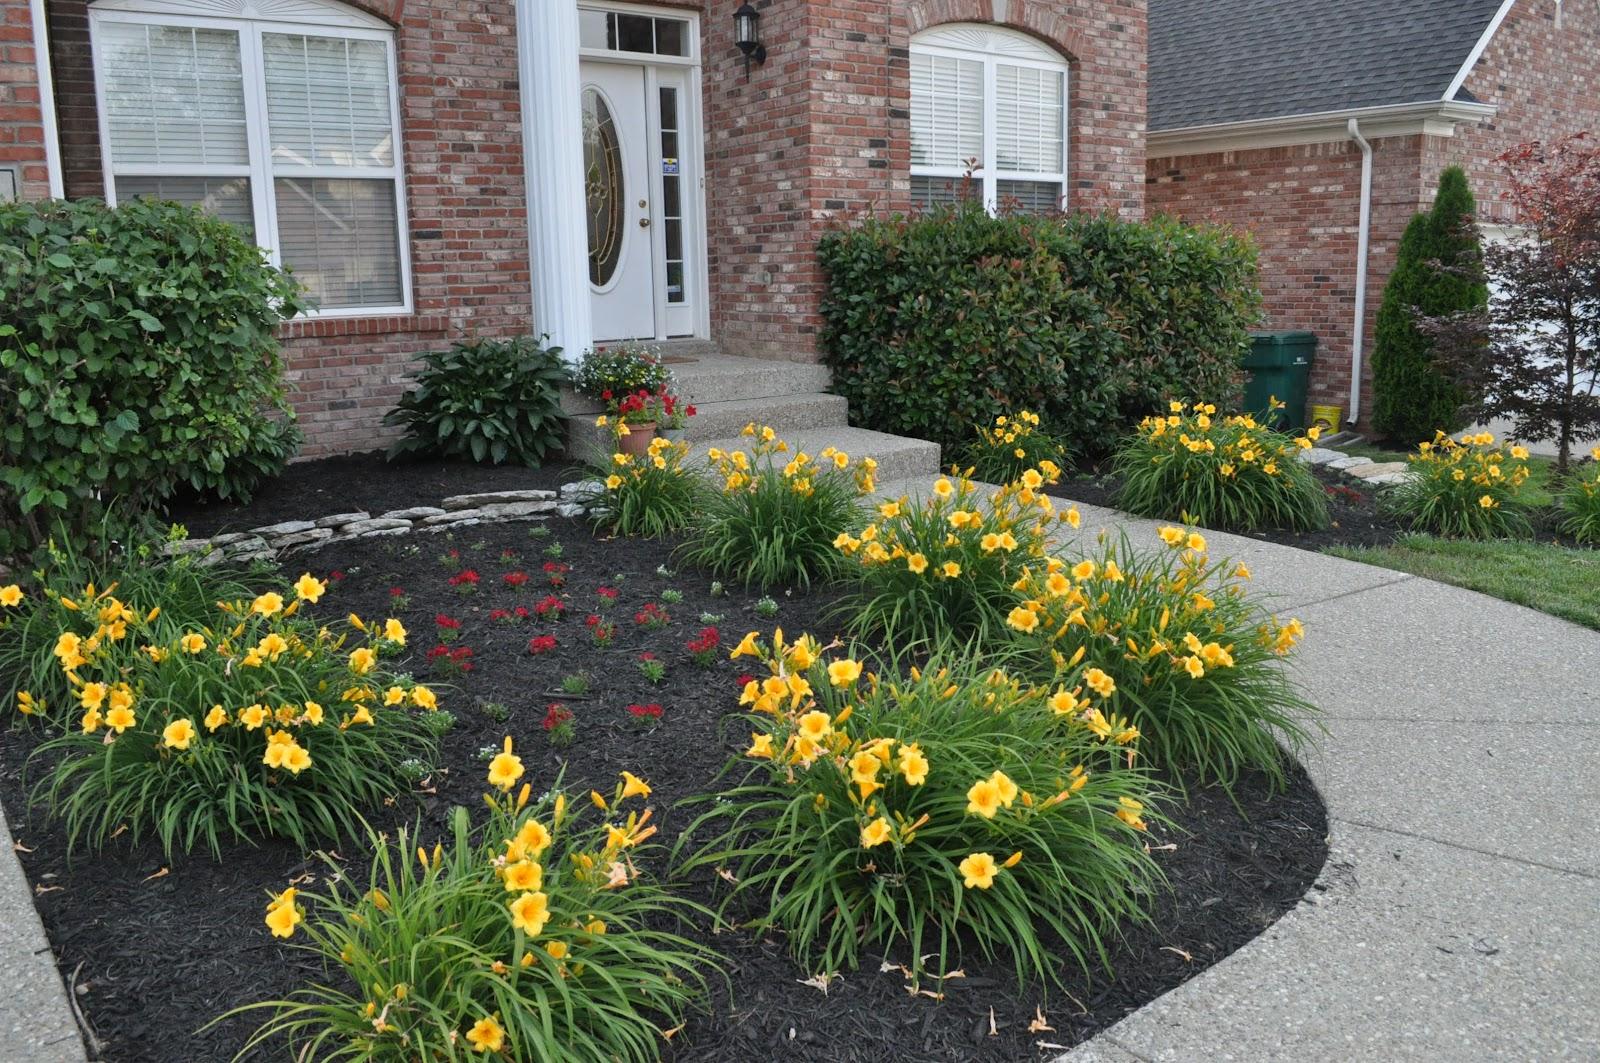 New landscaping emily ann interiors for Landscaping garden beds